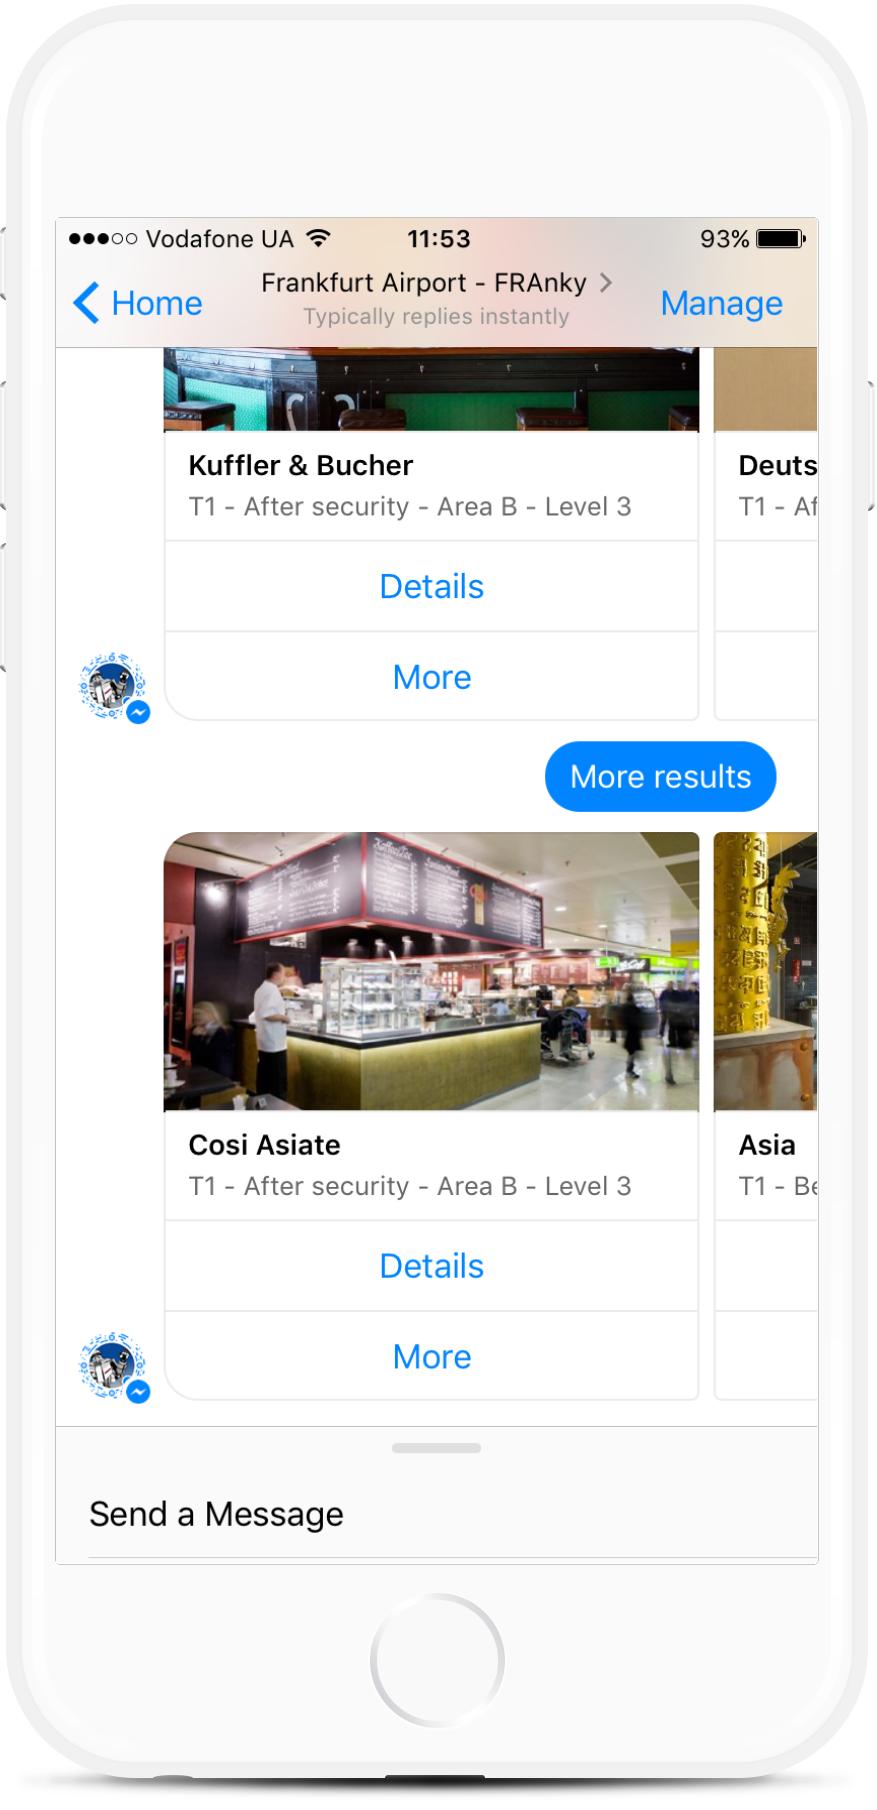 Airport Information Desk Facebook Bot from $99/mo   #messenger #bottemplates #bots #chatbots #aibots #fbmessenger #botmakers